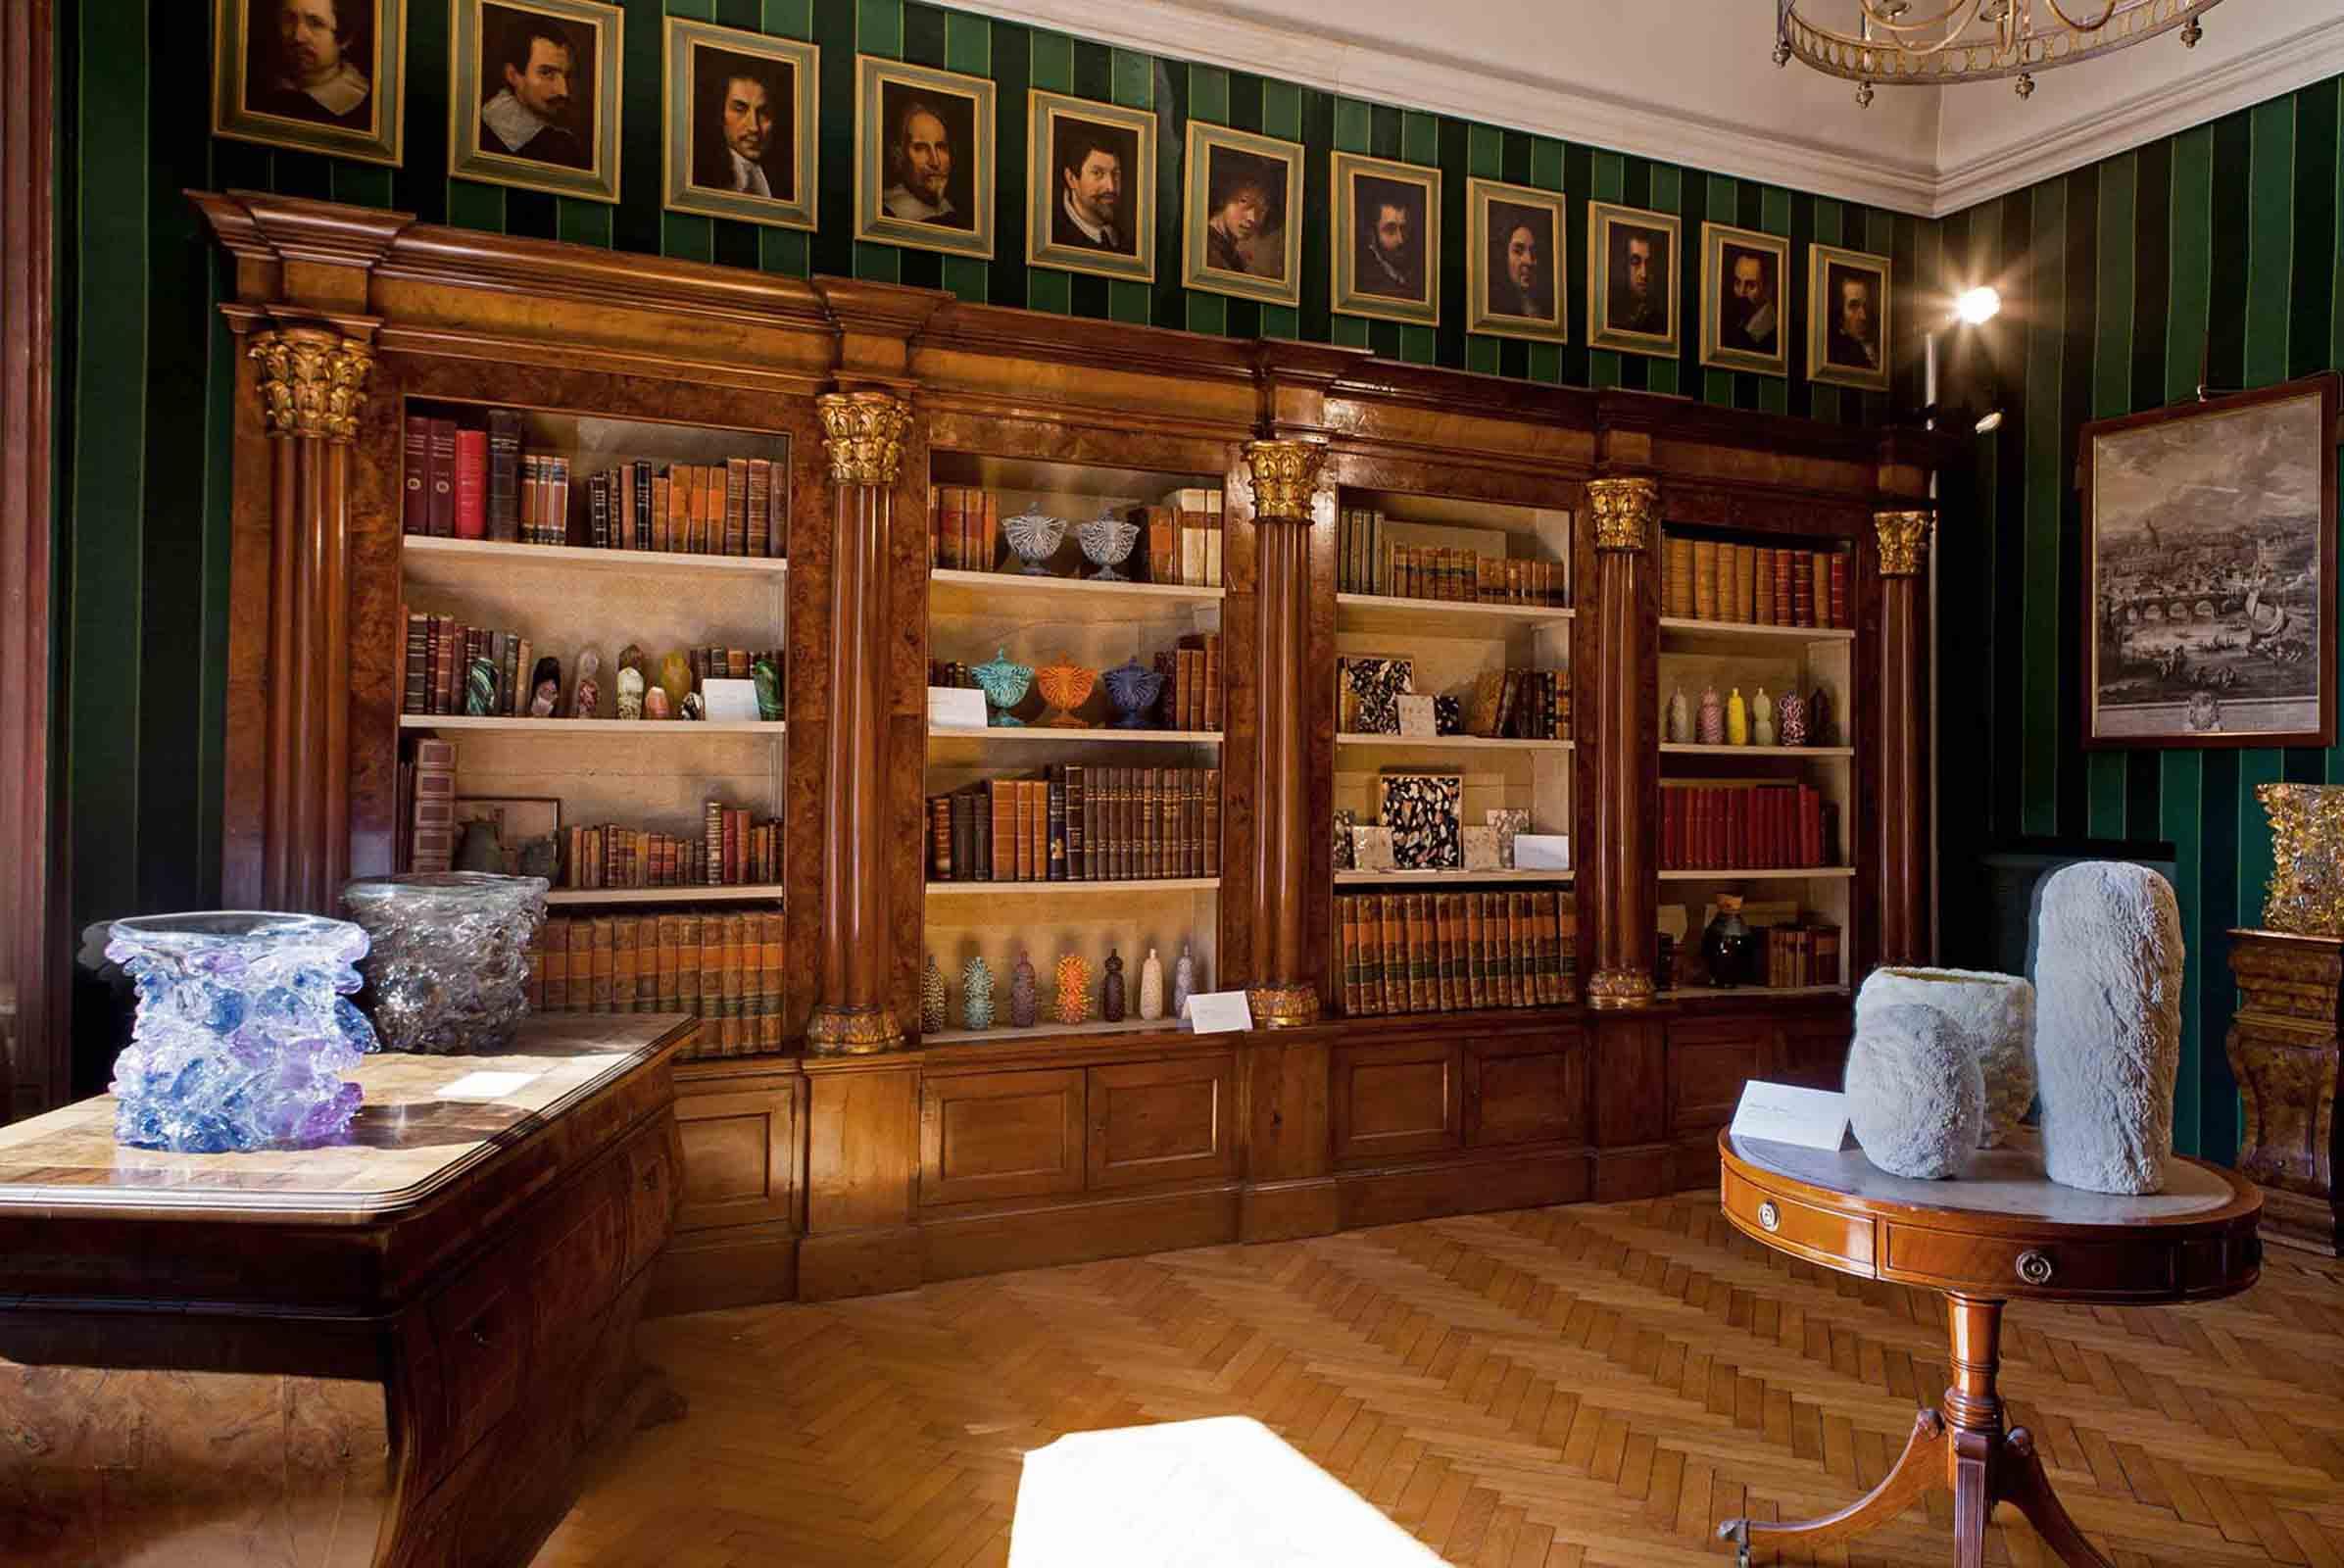 Passeggiata,-An-Airbnb-Experience-of-Milan,-featuring-Marcantonio,-.jpg